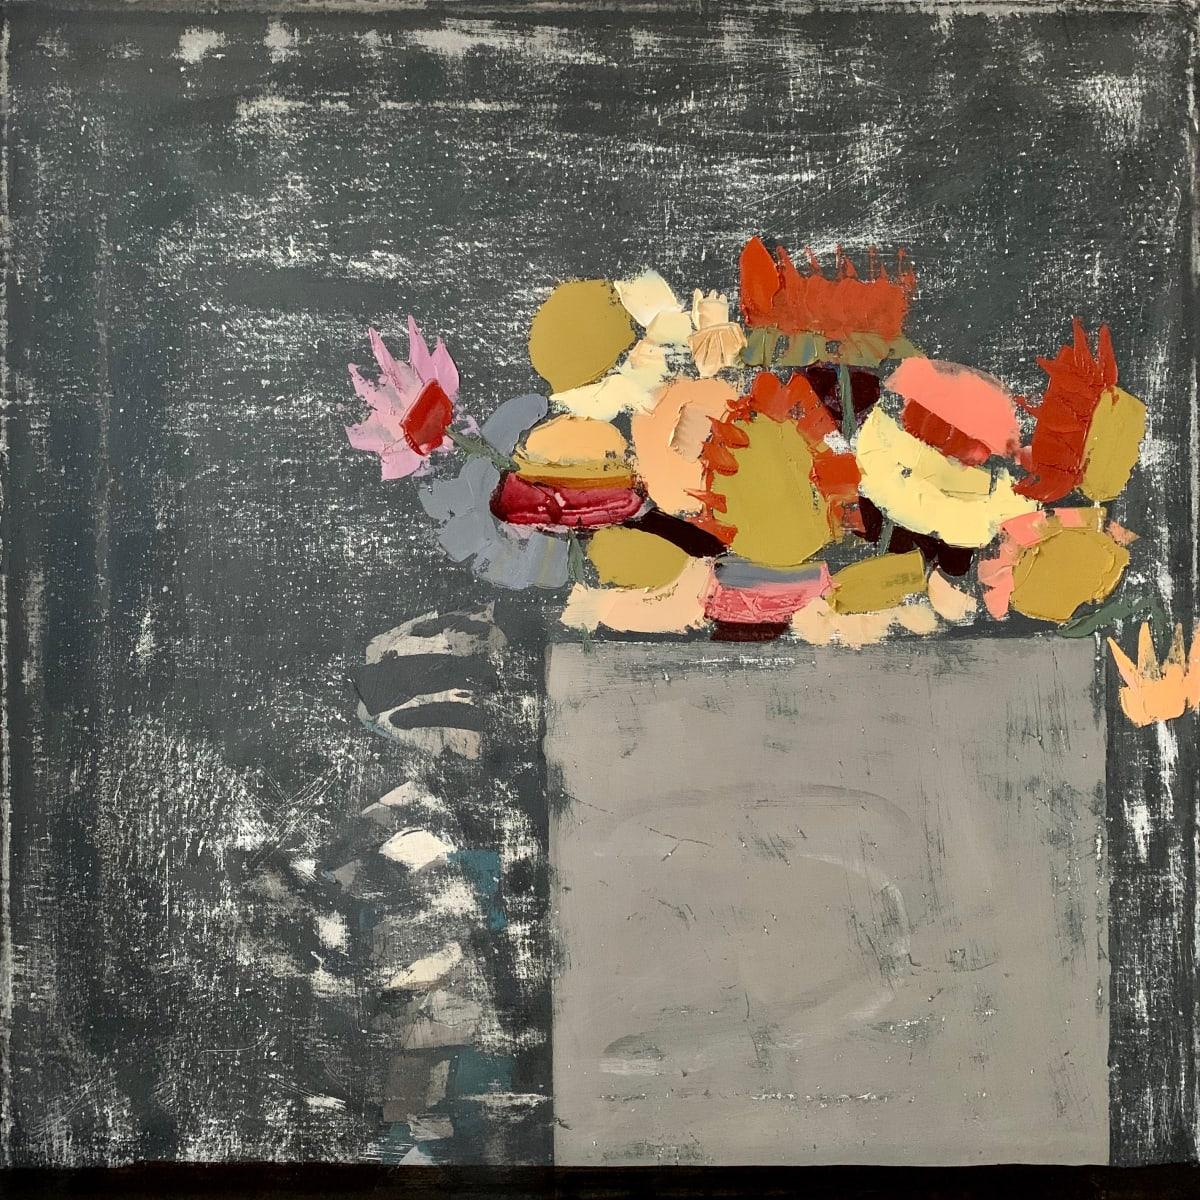 Sydney Licht, Still Life with Flowers, 2019